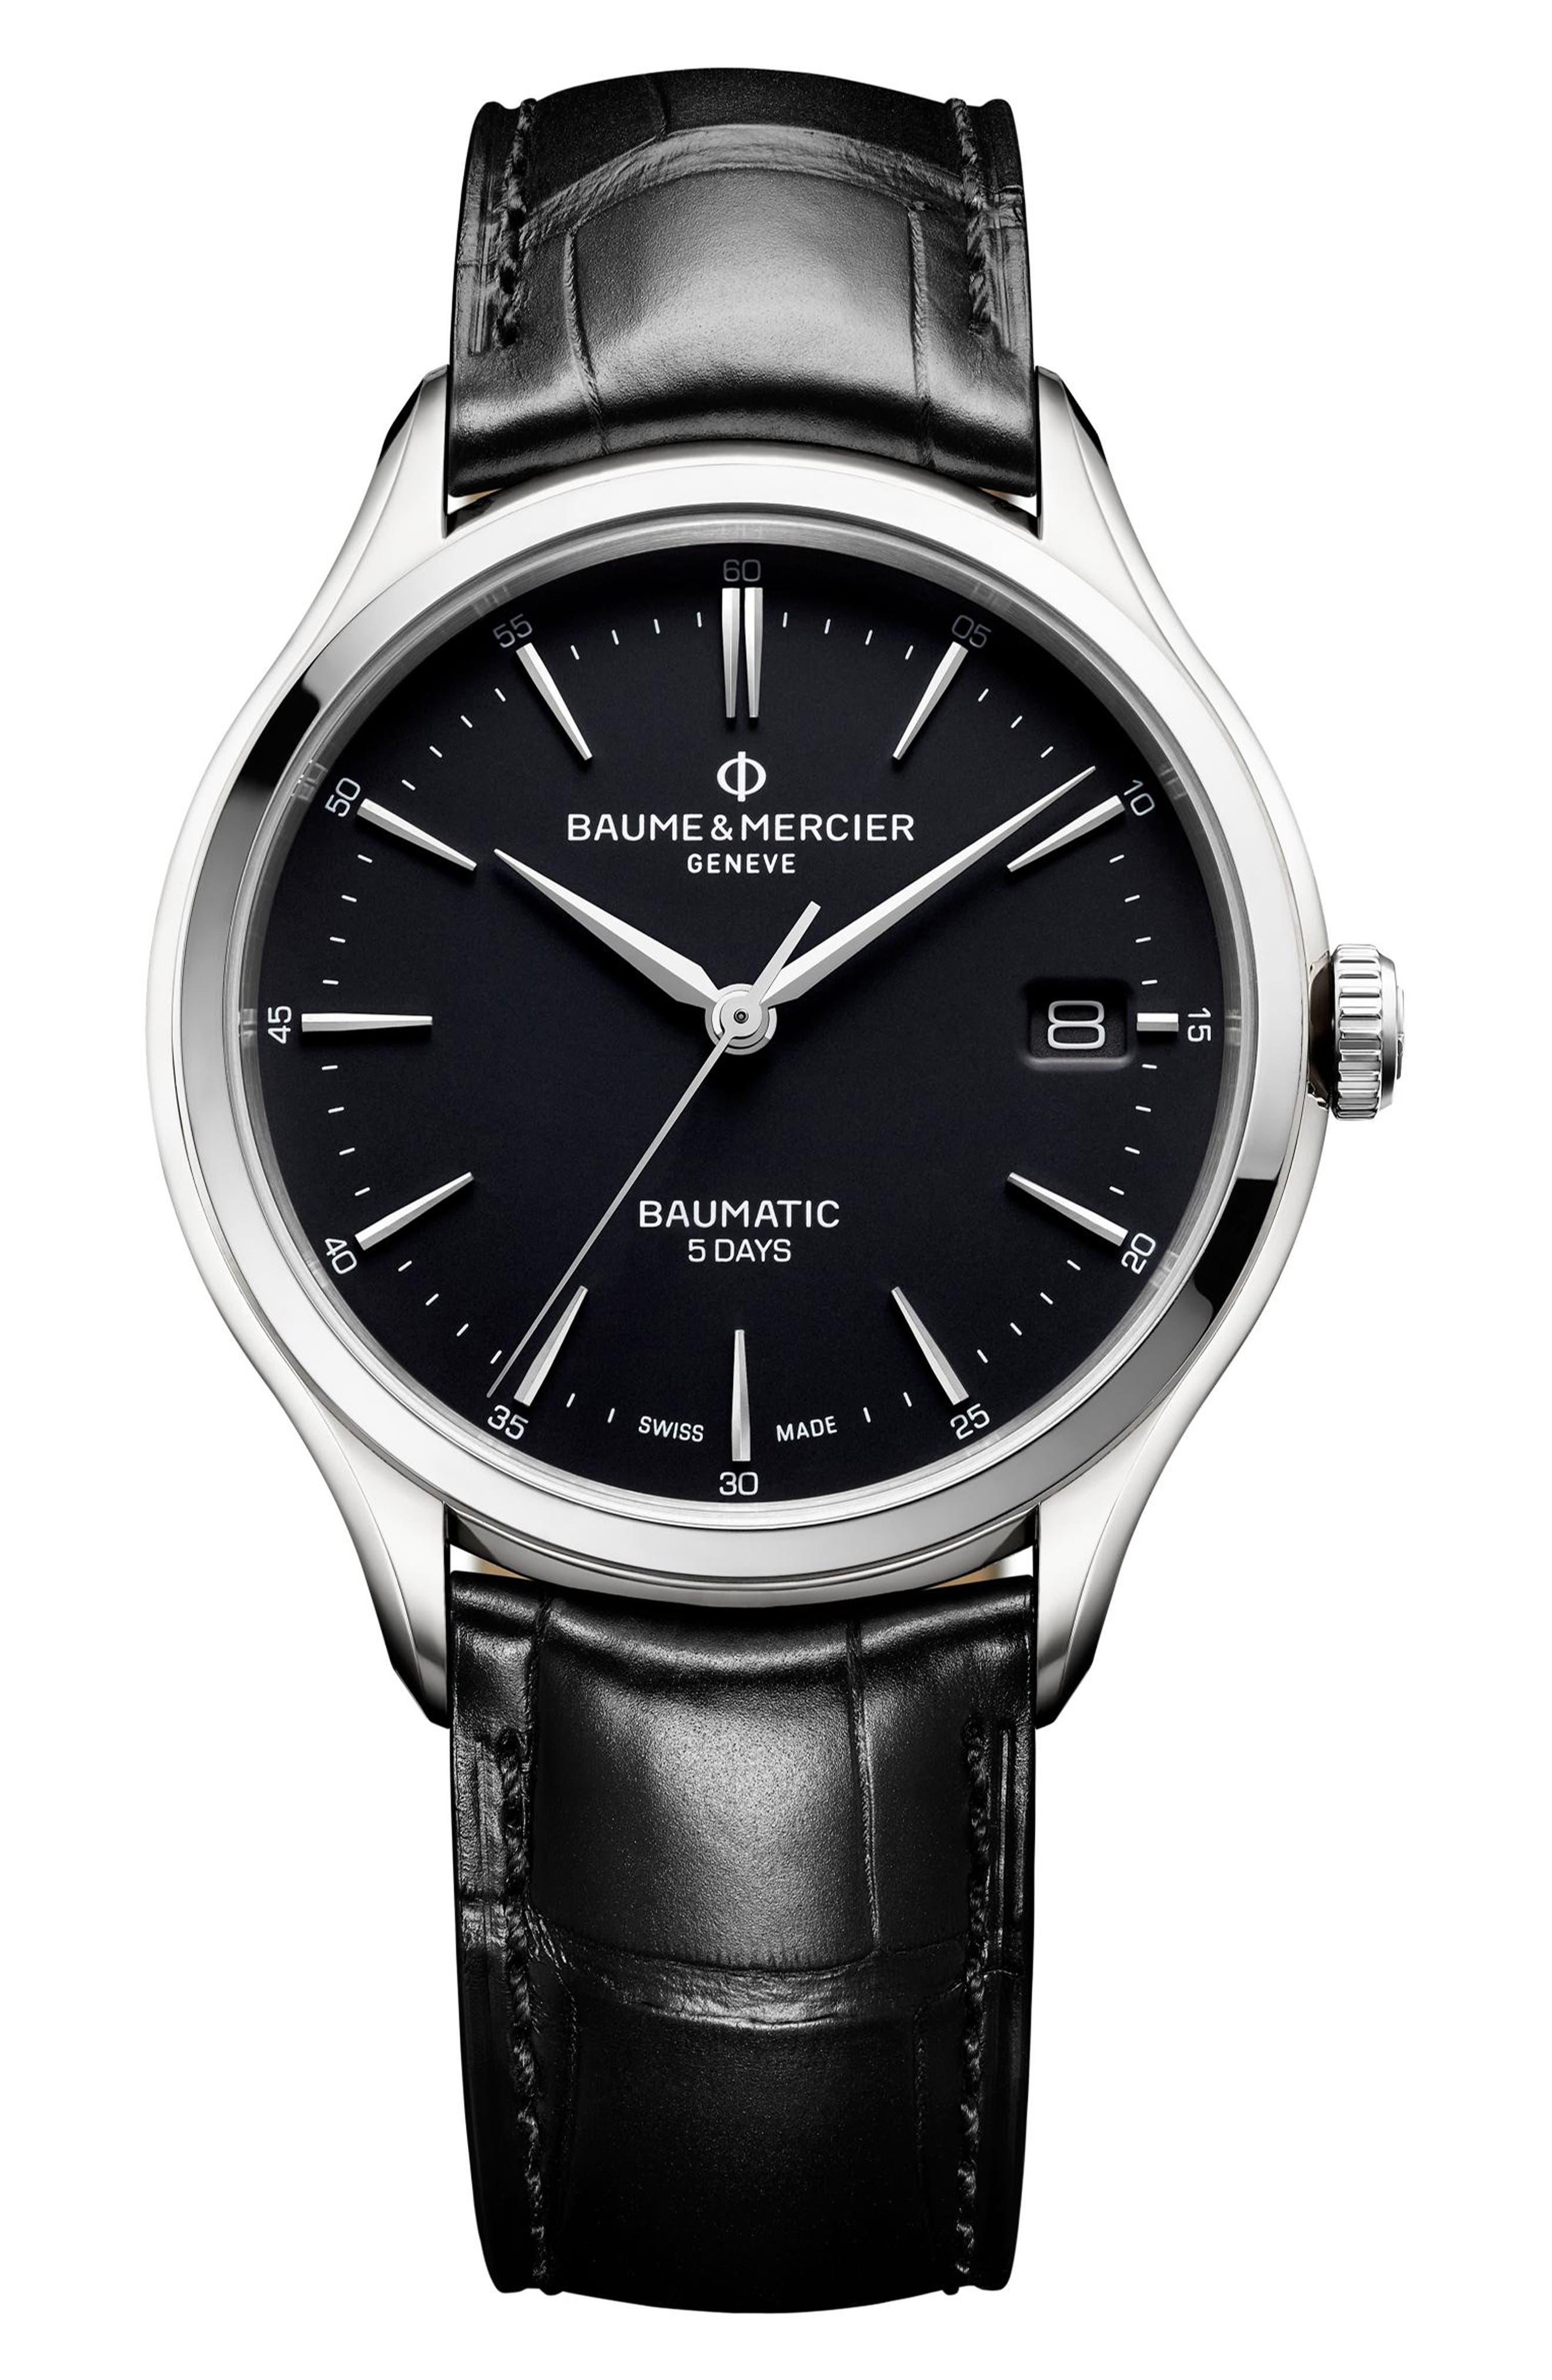 BAUME & MERCIER Baumatic Automatic Leather Strap Watch, 40Mm in Black/ Black